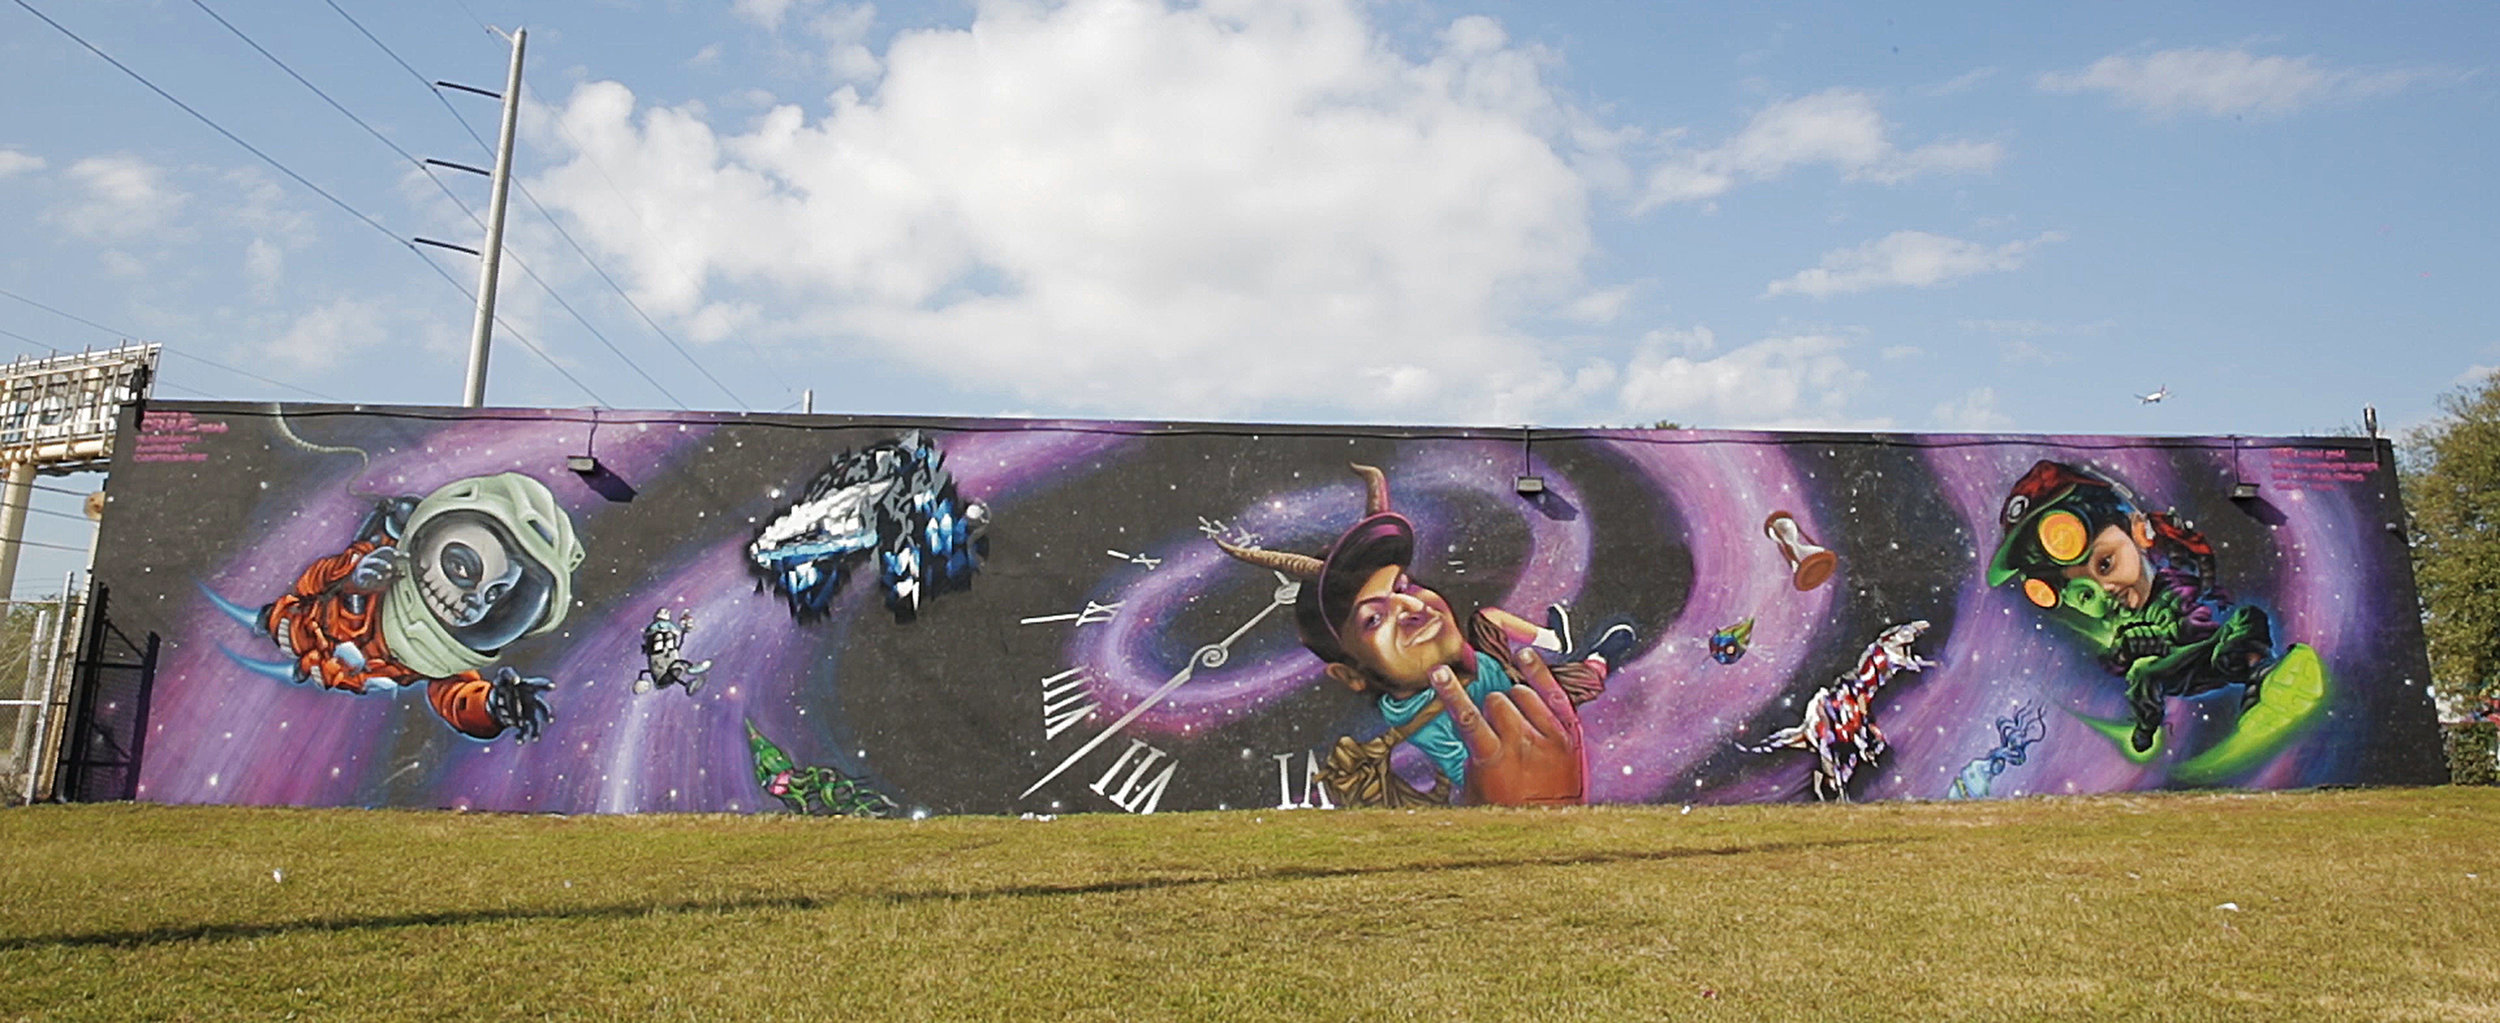 Time Travelers-ArtBasel Miami.jpg